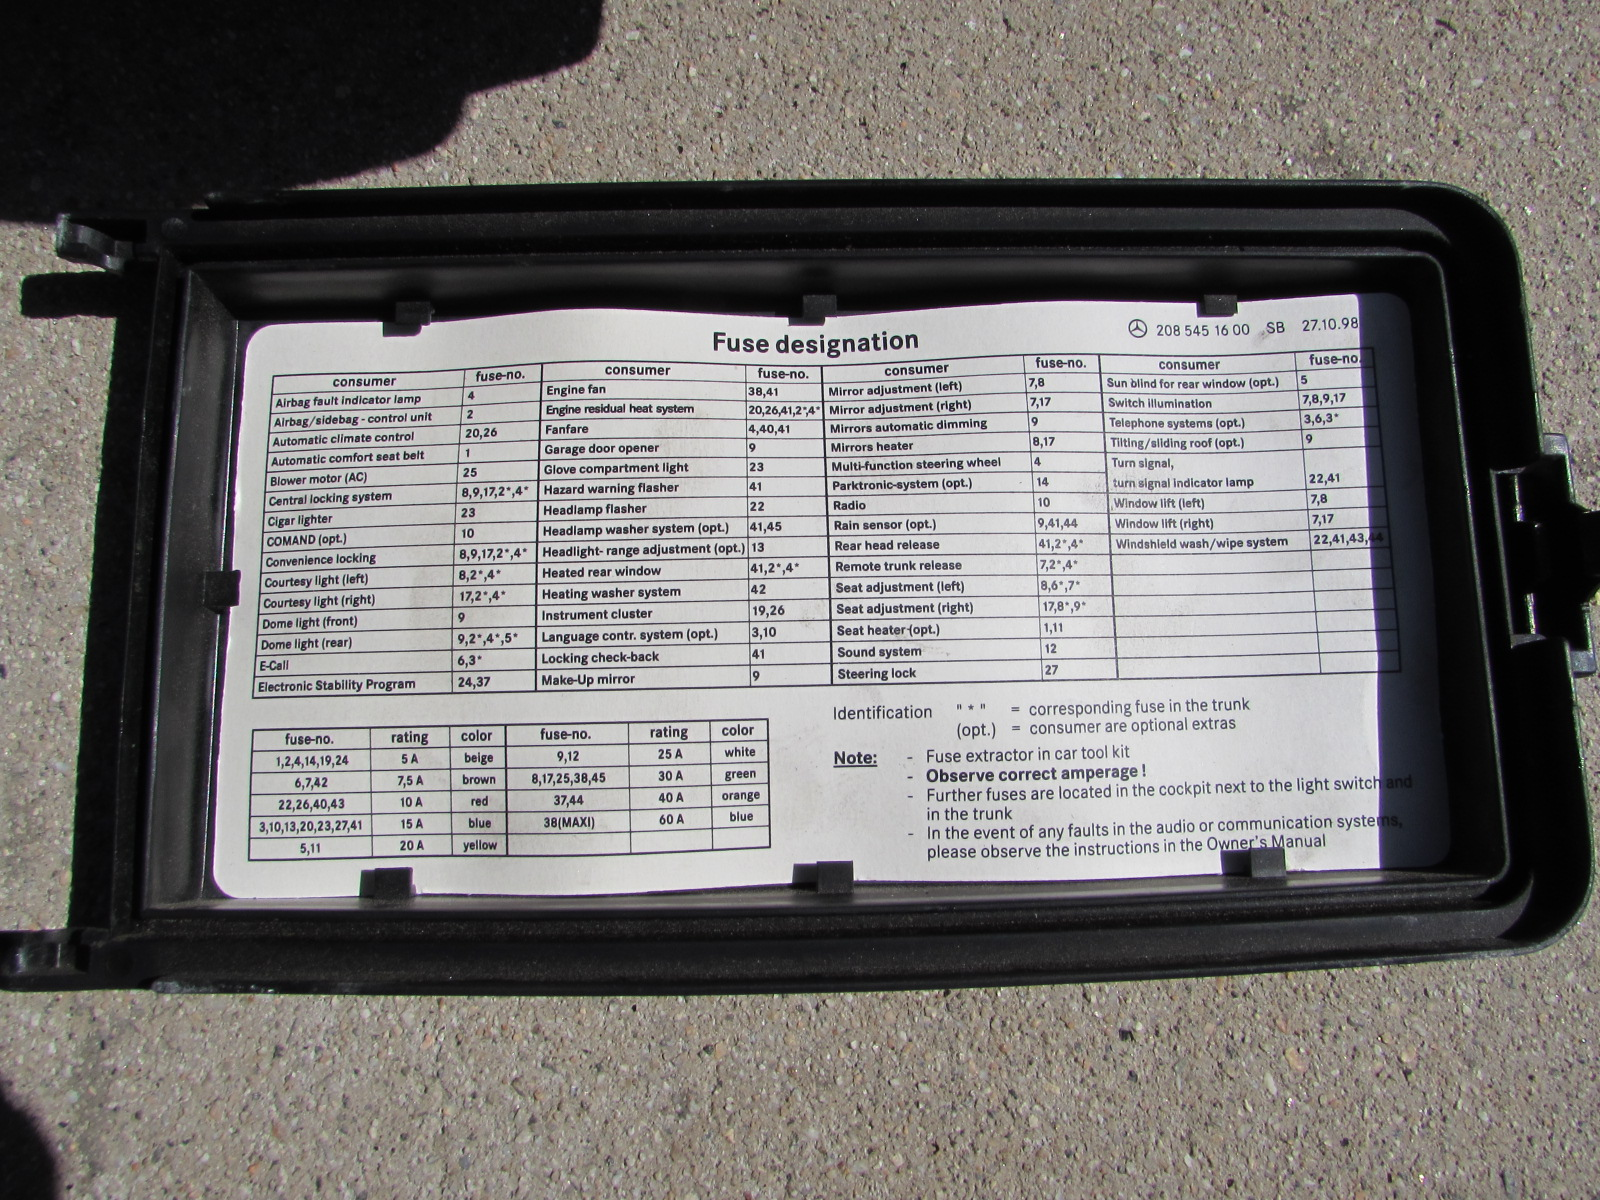 mercedes sprinter fuse box diagram 2002 chevy venture radio wiring 2085400050 w208 w202 clk c class